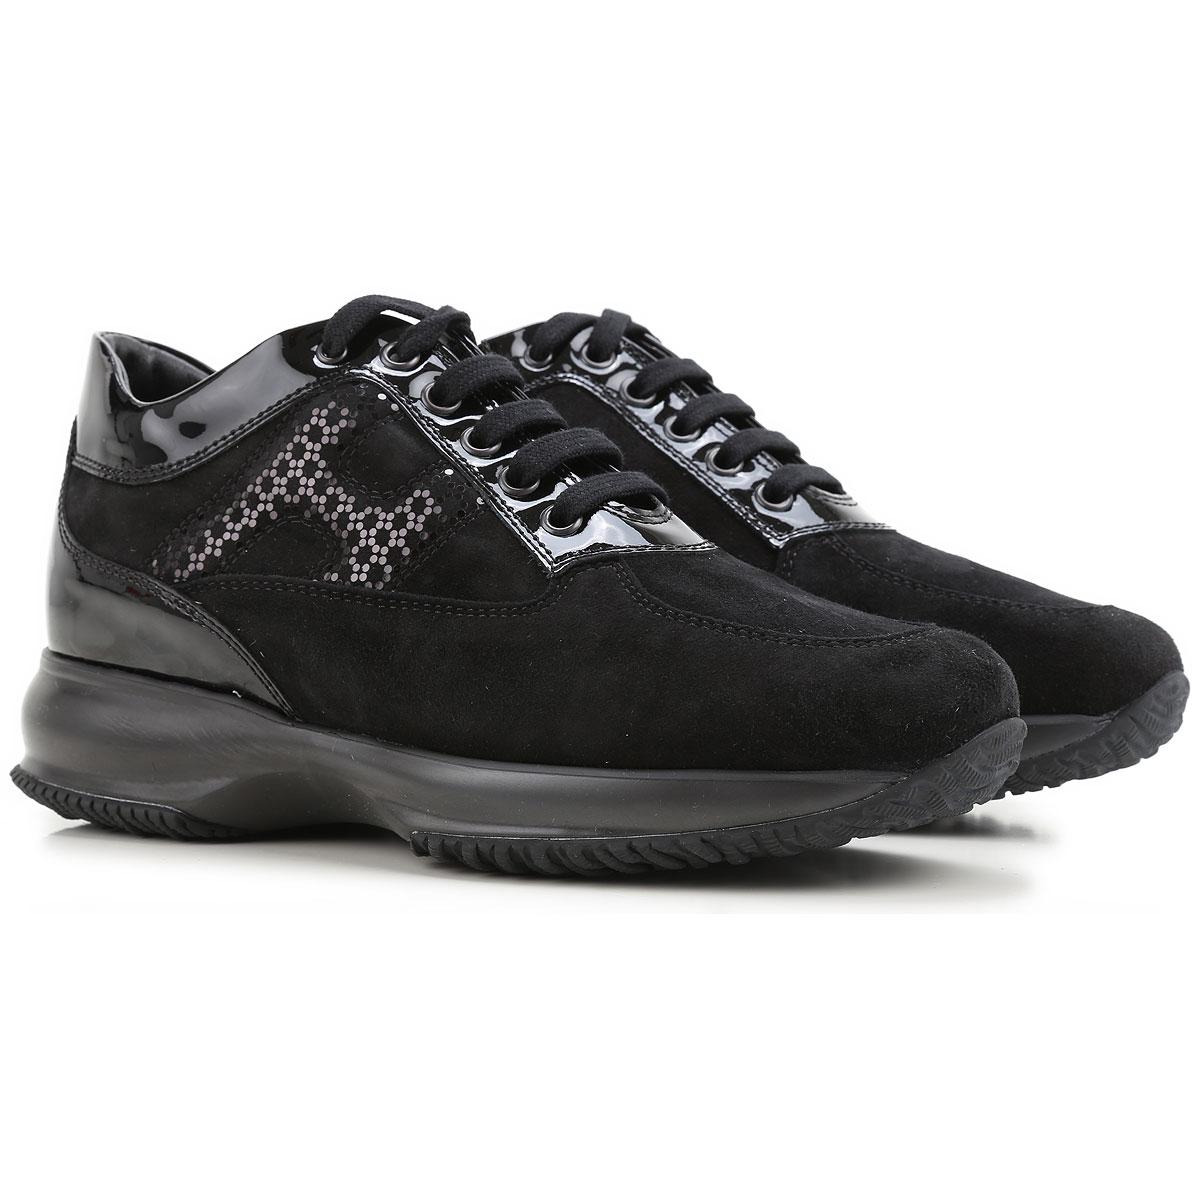 chaussures femme hogan code produit hxw00n0v35025qb999. Black Bedroom Furniture Sets. Home Design Ideas